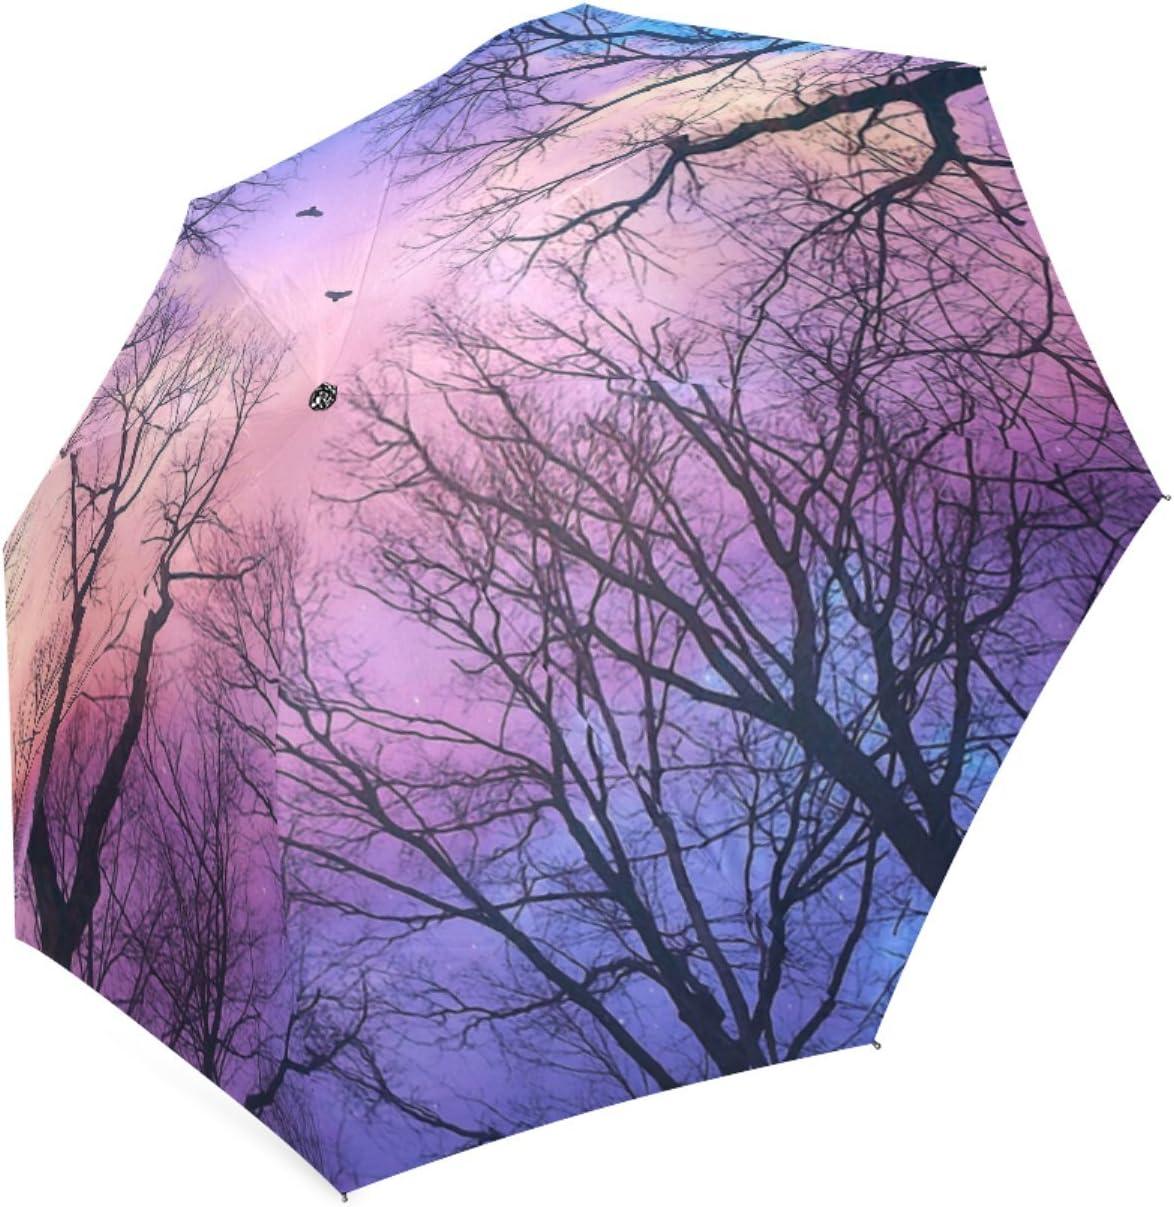 Beautytool Customized A New Day Will Dawn Folding Travel Umbrella